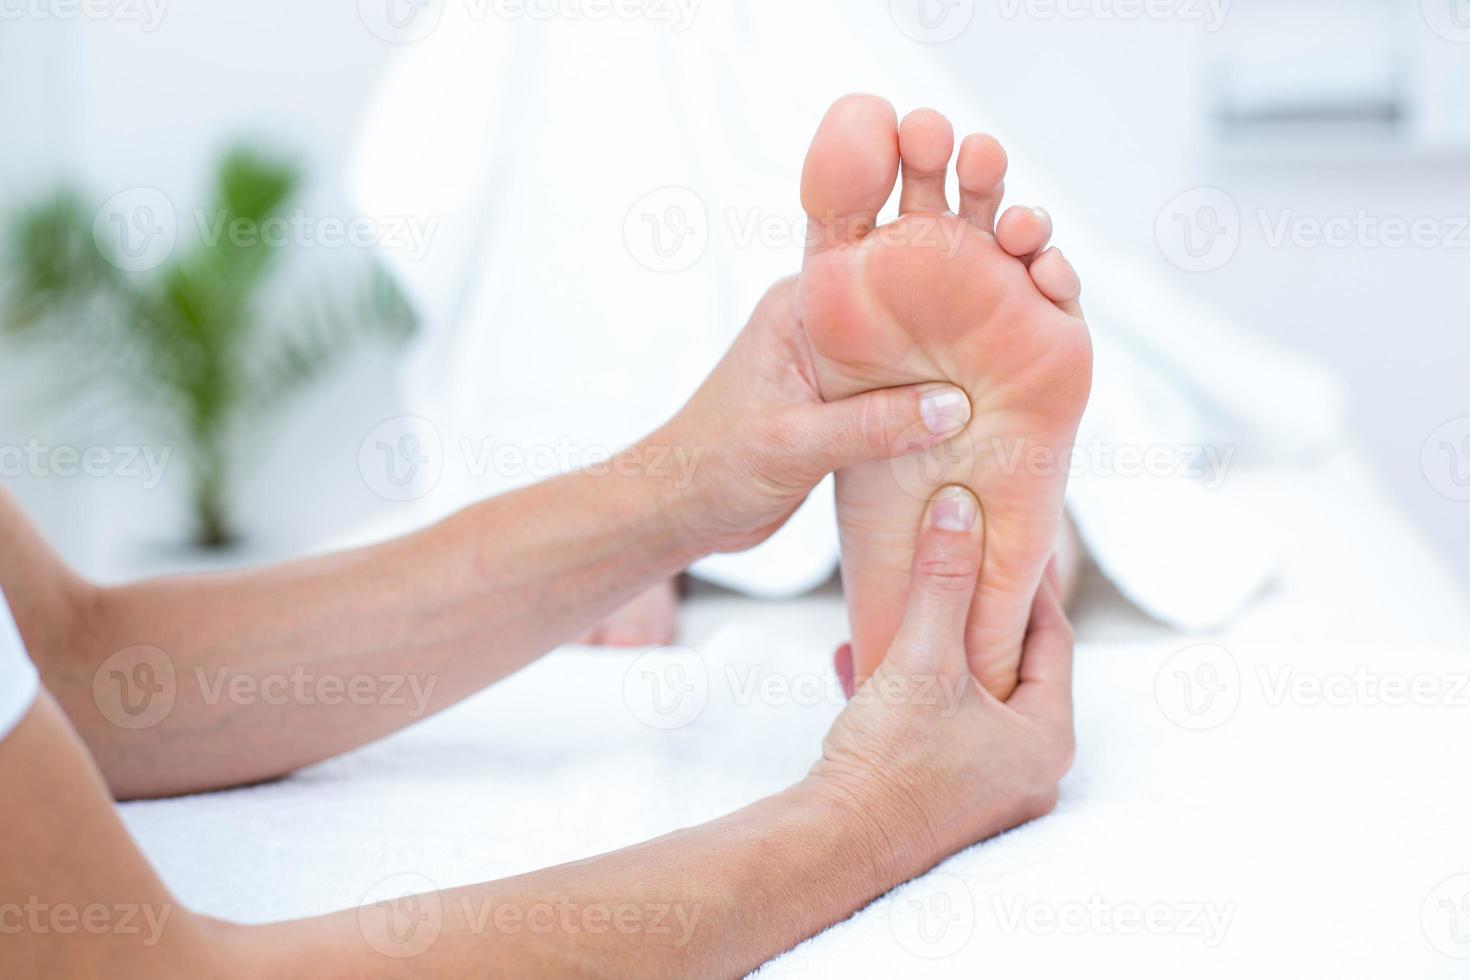 fysioterapeut som gör fotmassage foto